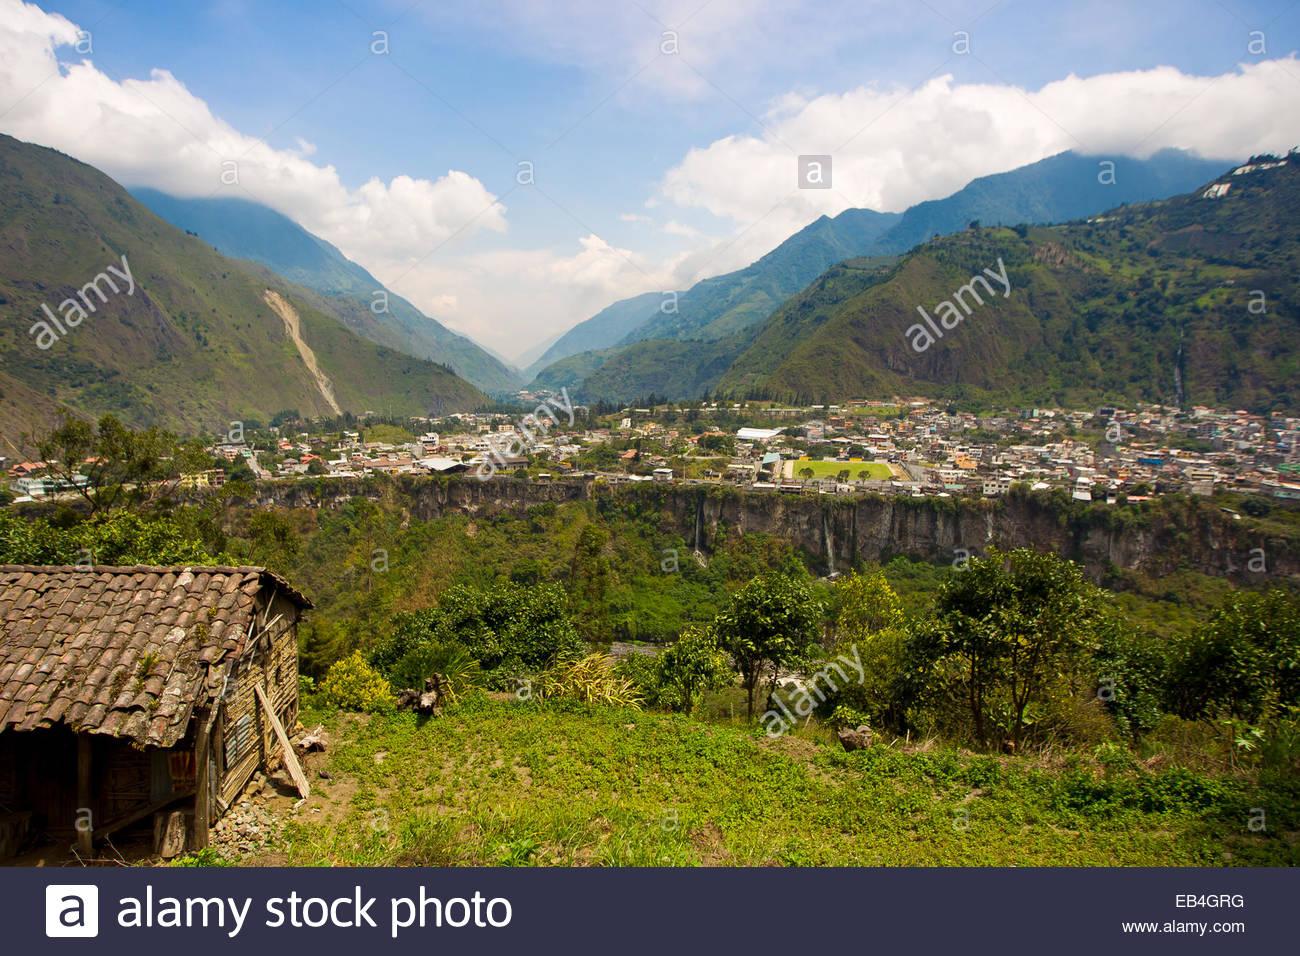 A view of the town of Banos de Agua Santa at the base of the Tungurahua volcano. - Stock Image